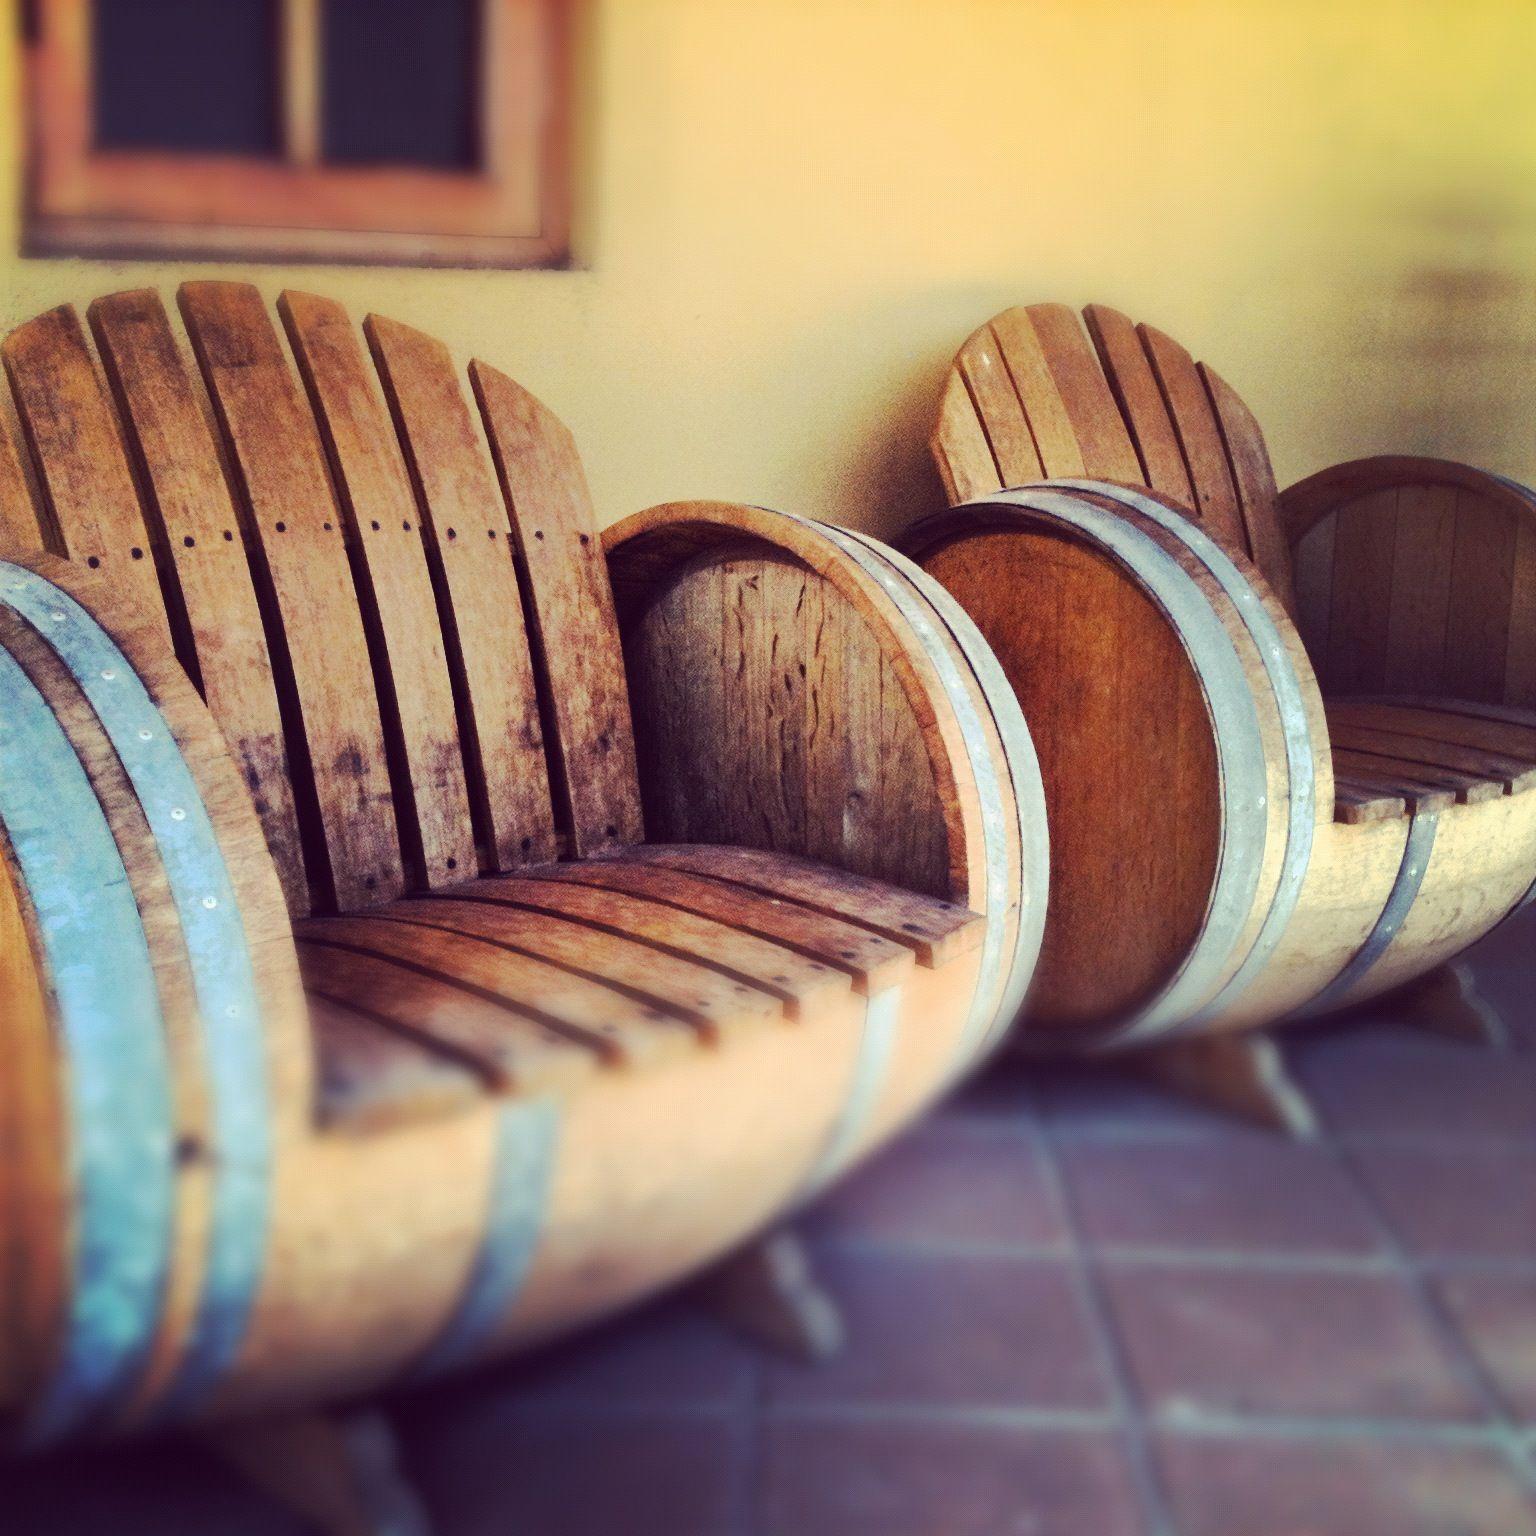 wine barrel furniture wine wine cellar wine barrel chair arched napa valley wine barrel table